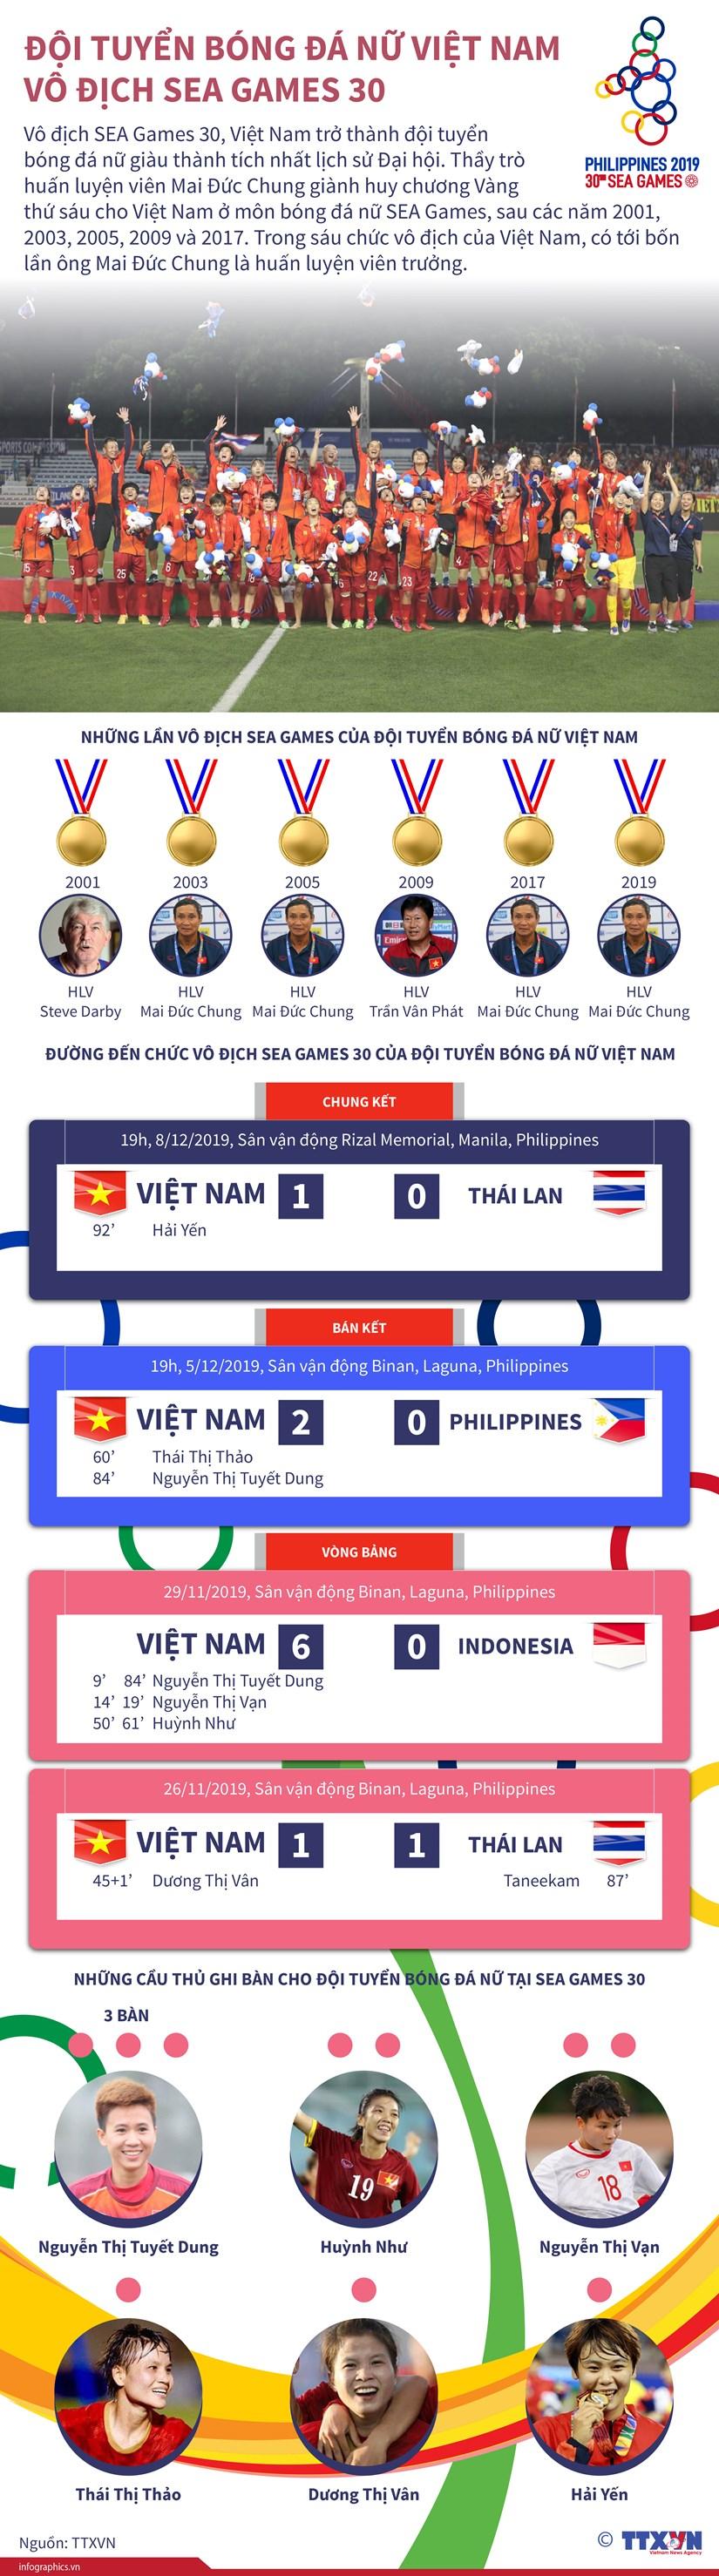 [Infographics] Doi tuyen bong da nu Viet Nam vo dich SEA Games 30 hinh anh 1